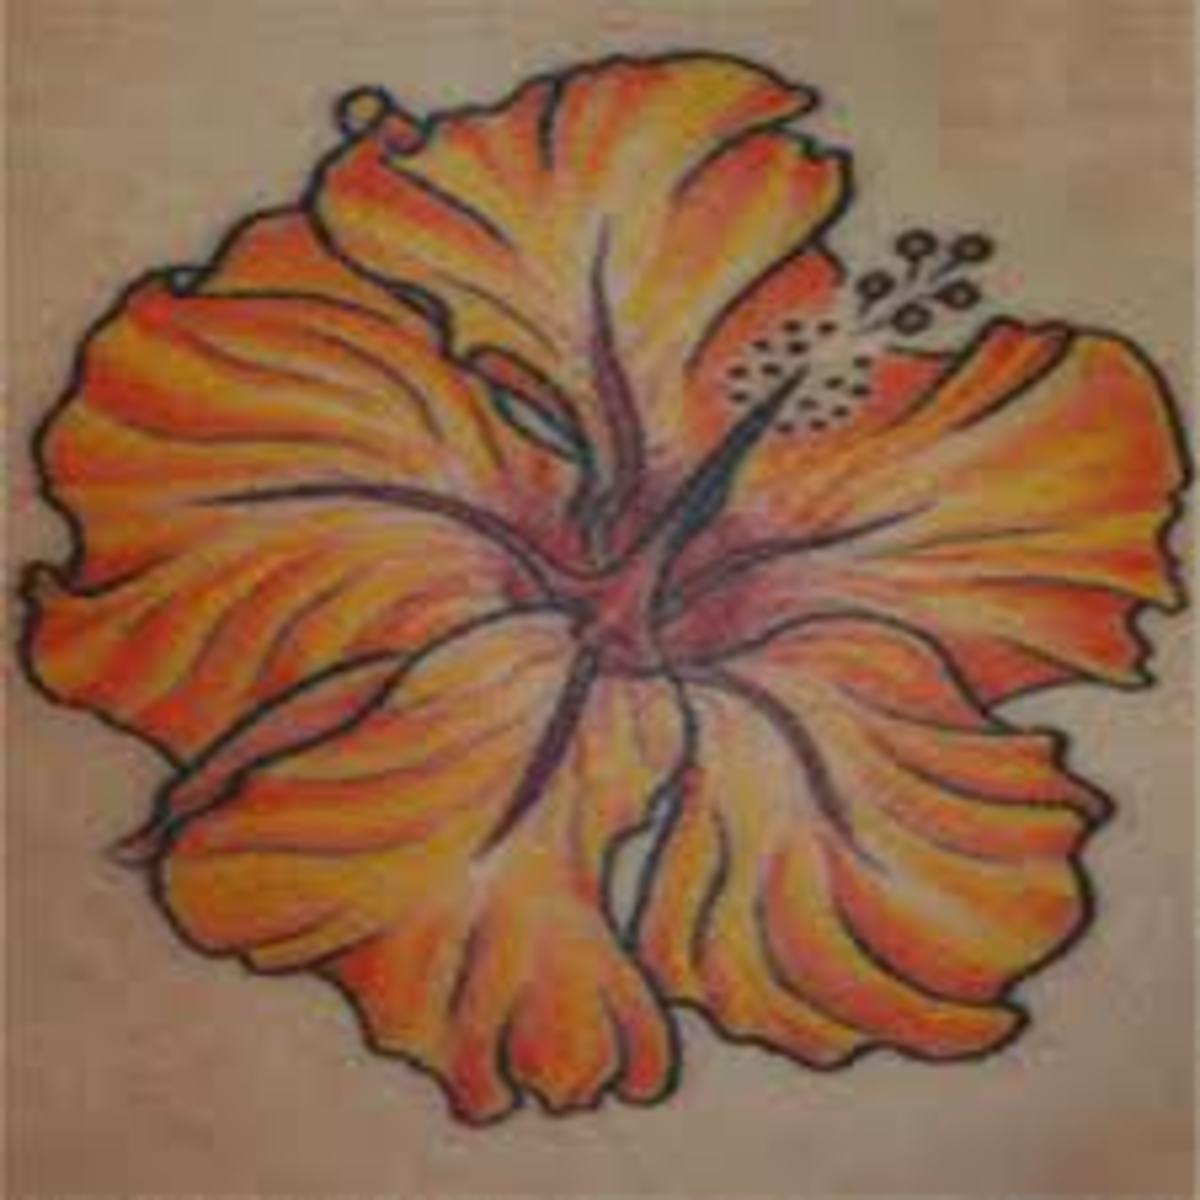 Pacific island tattoos moko style and hawaiian tattoos for Hawaiian flower tattoos meaning